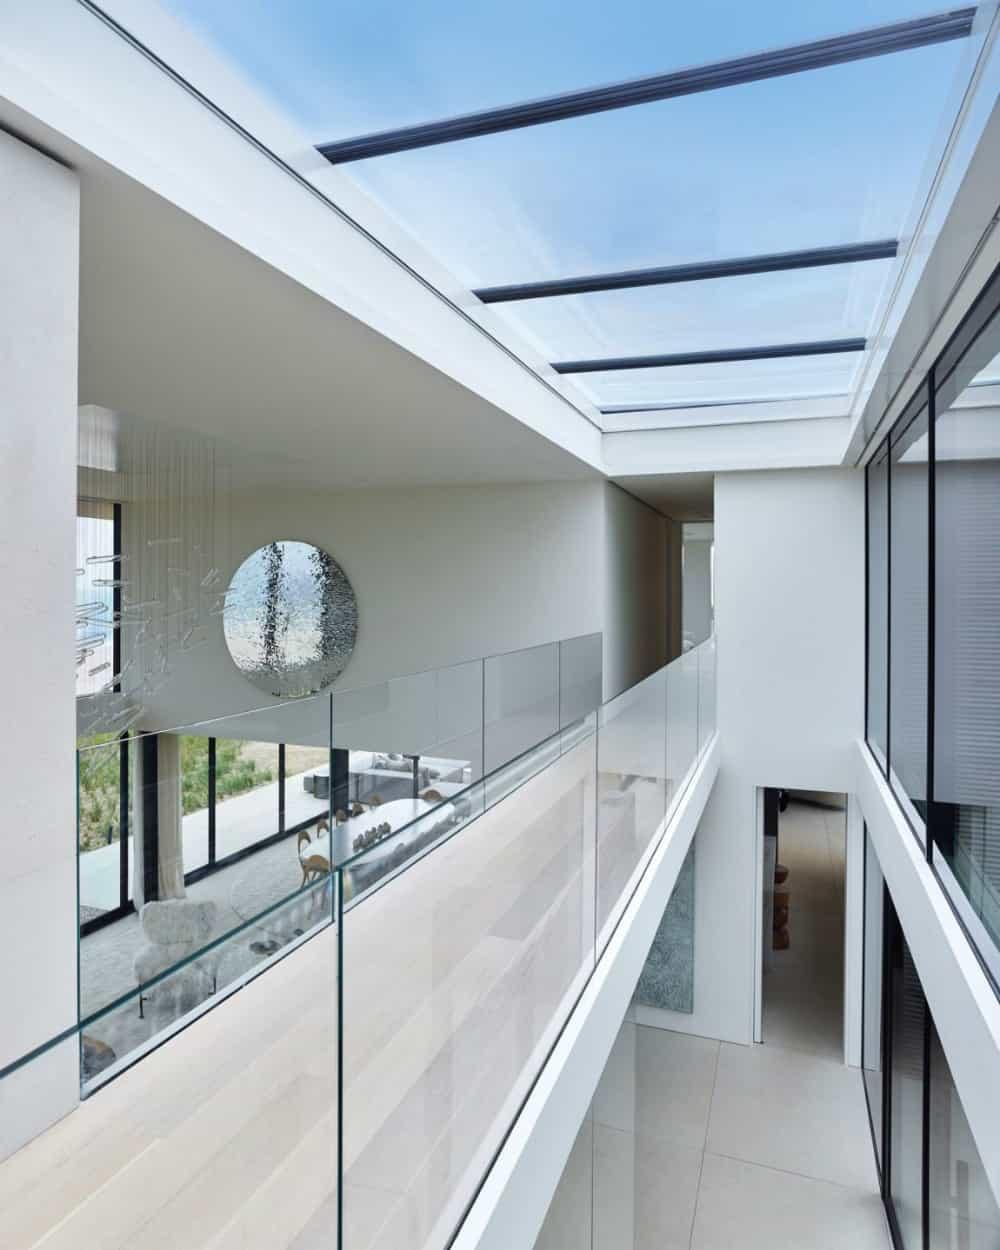 The hallway has its own atrium